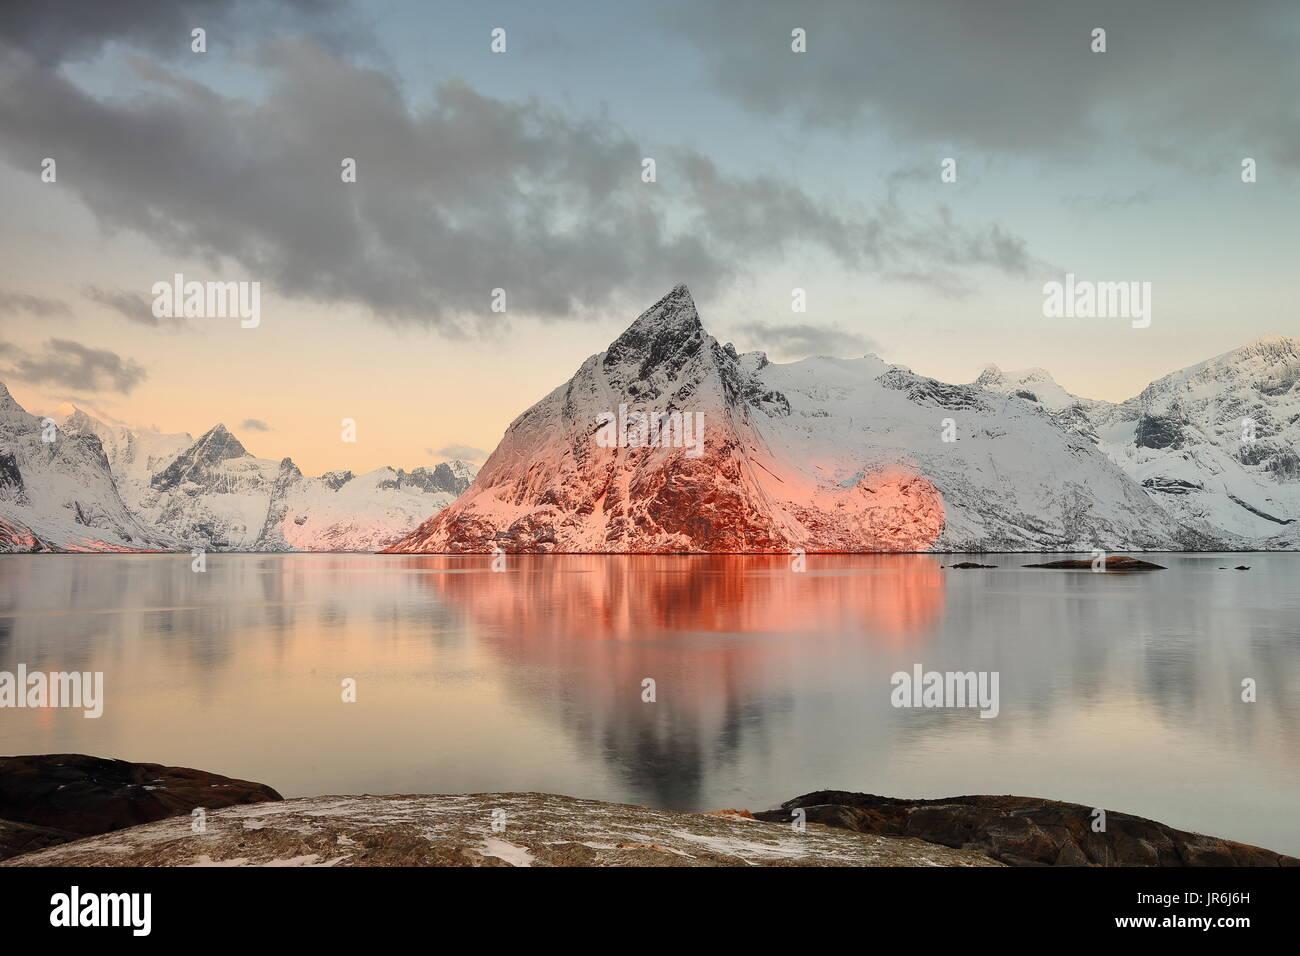 Reddish dawn-view to NW.from Toppoya island over Reinefjorden to Forsfjorden-Vorfjorden and Sauhagtindan-Klokkaattetinden-Brynliskartinden-Olstinden m - Stock Image